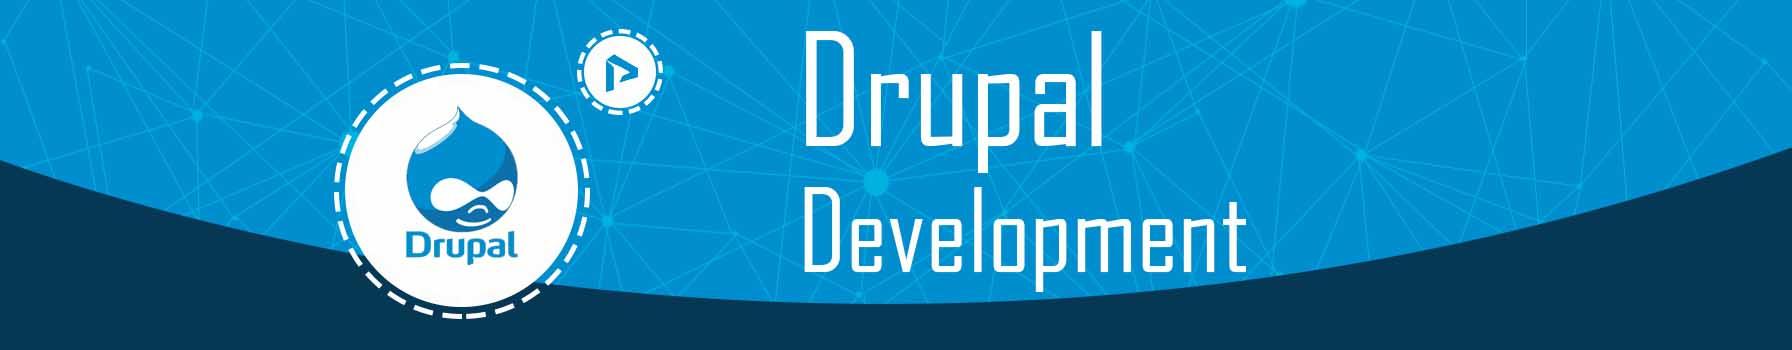 drupal-development.jpg